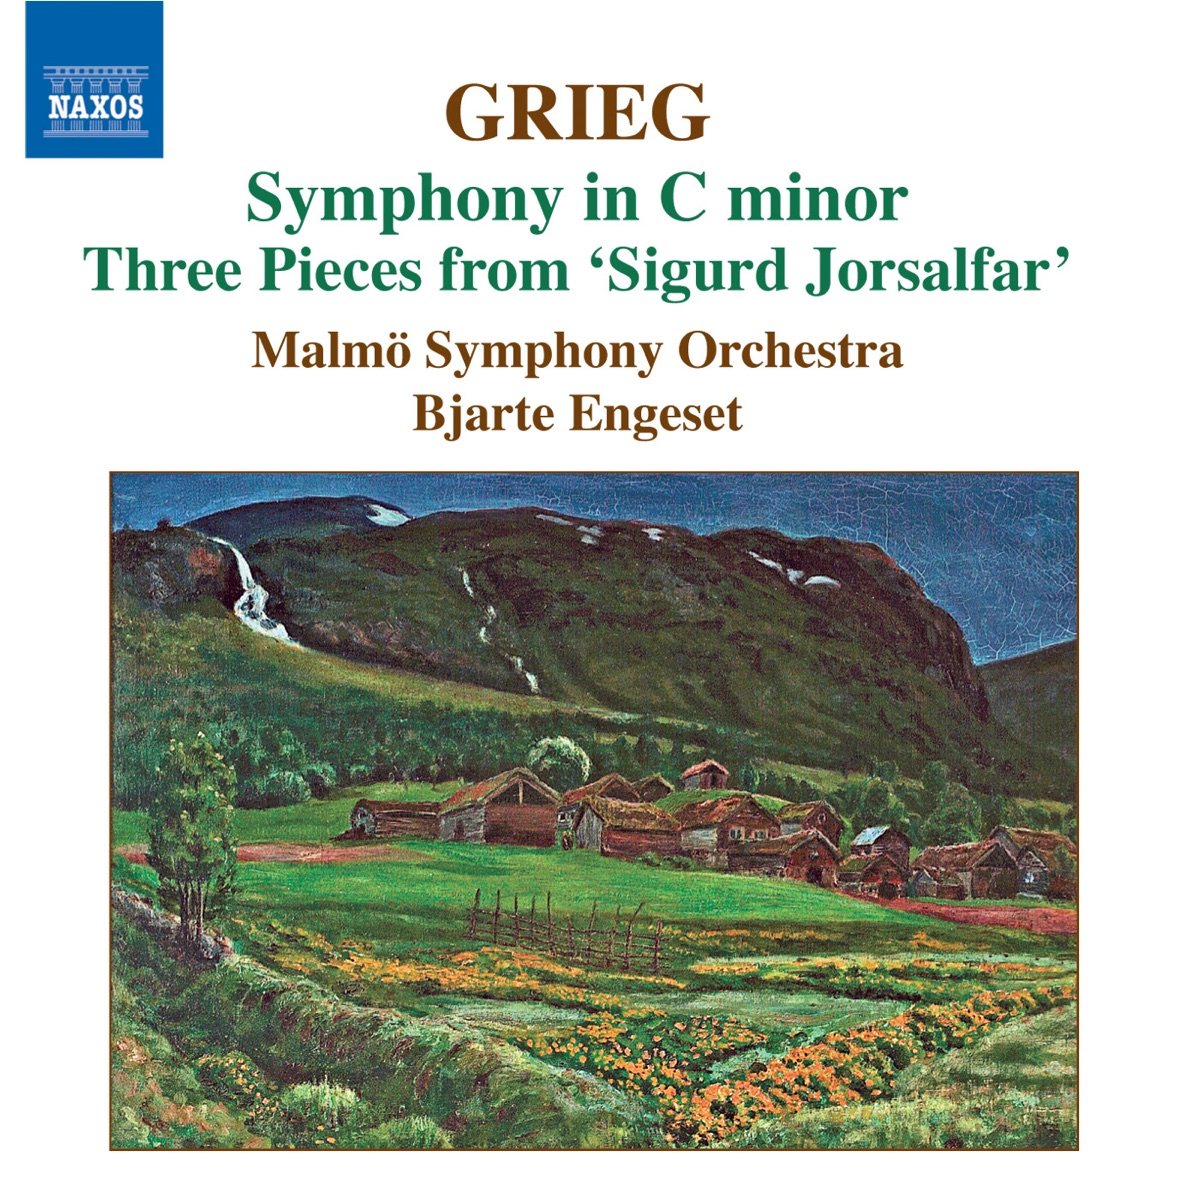 Grieg Symphony in C Minor Bjarte Engeset  Malmö Symphony Orchestra CD cover